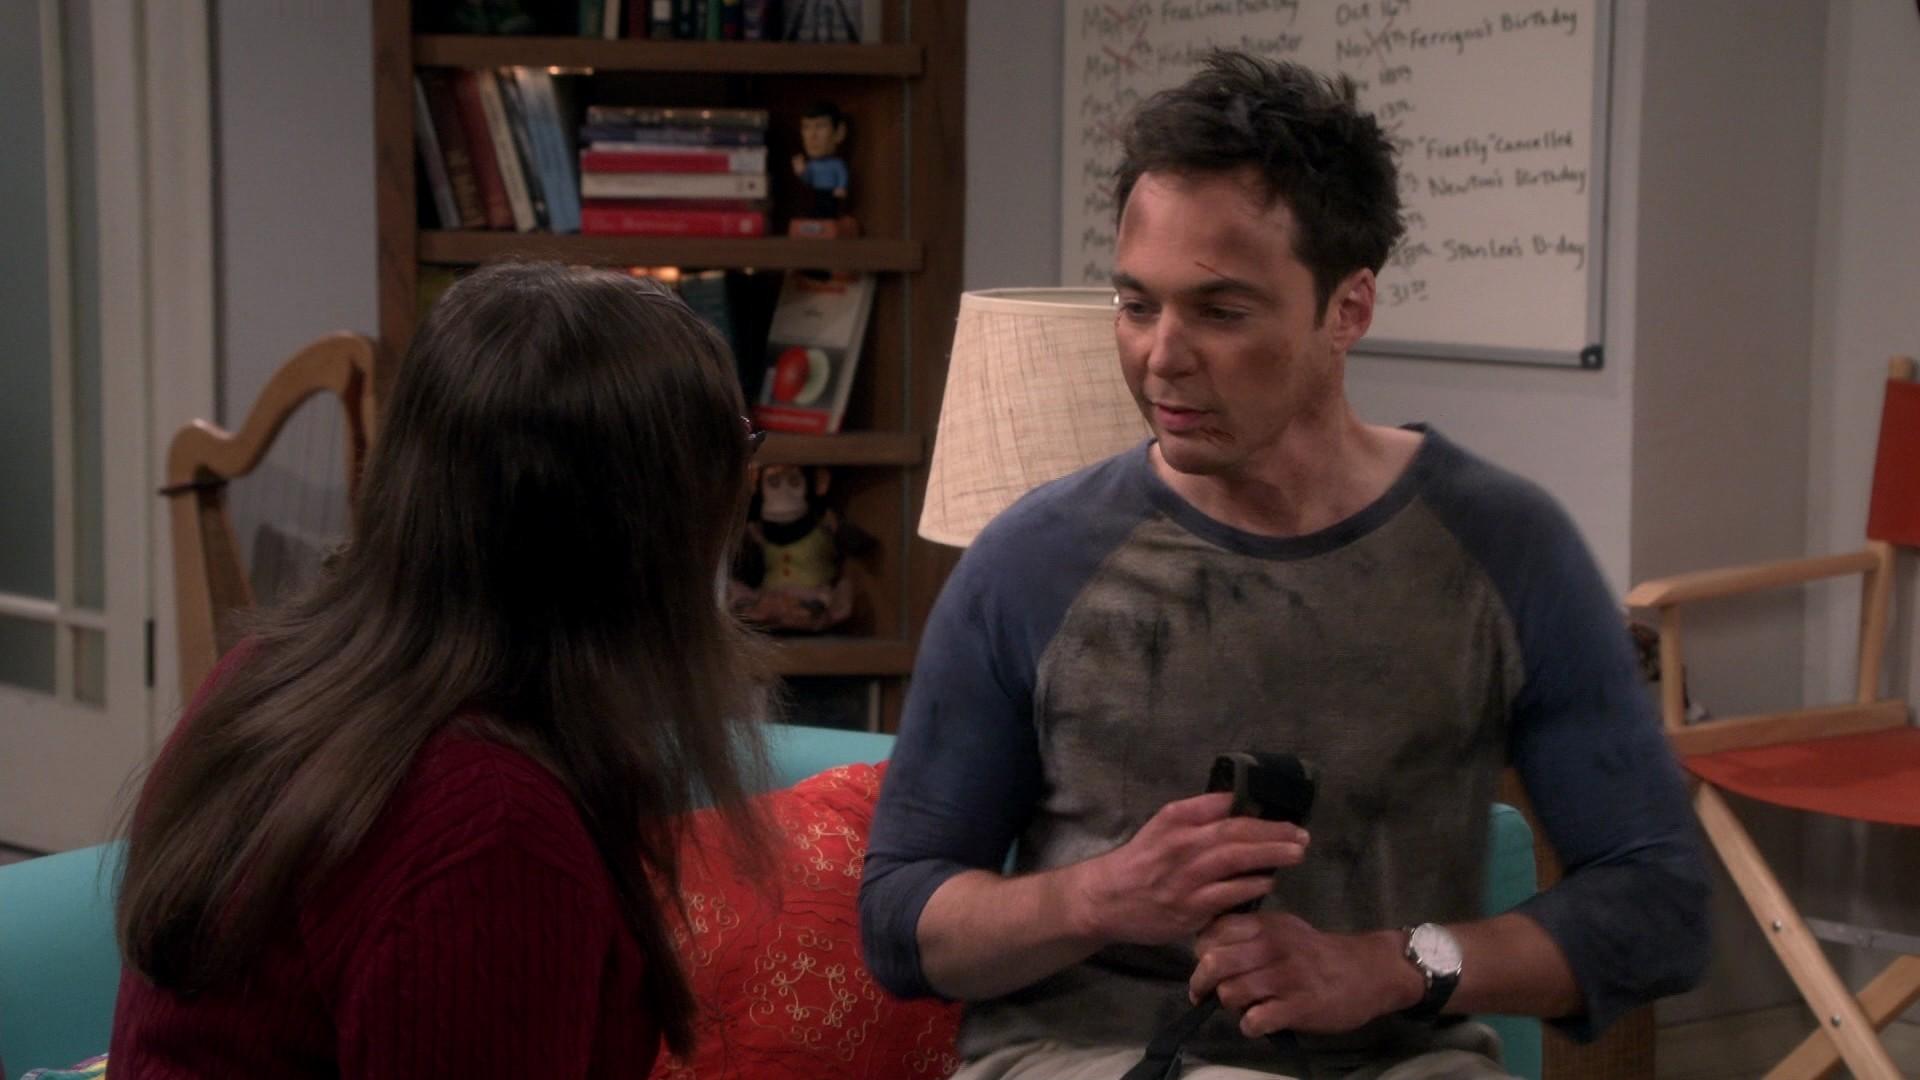 Теория большого взрыва / The Big Bang Theory [11x01-07 из 24] (2017) HDTVRip 1080p | Кураж-Бамбей